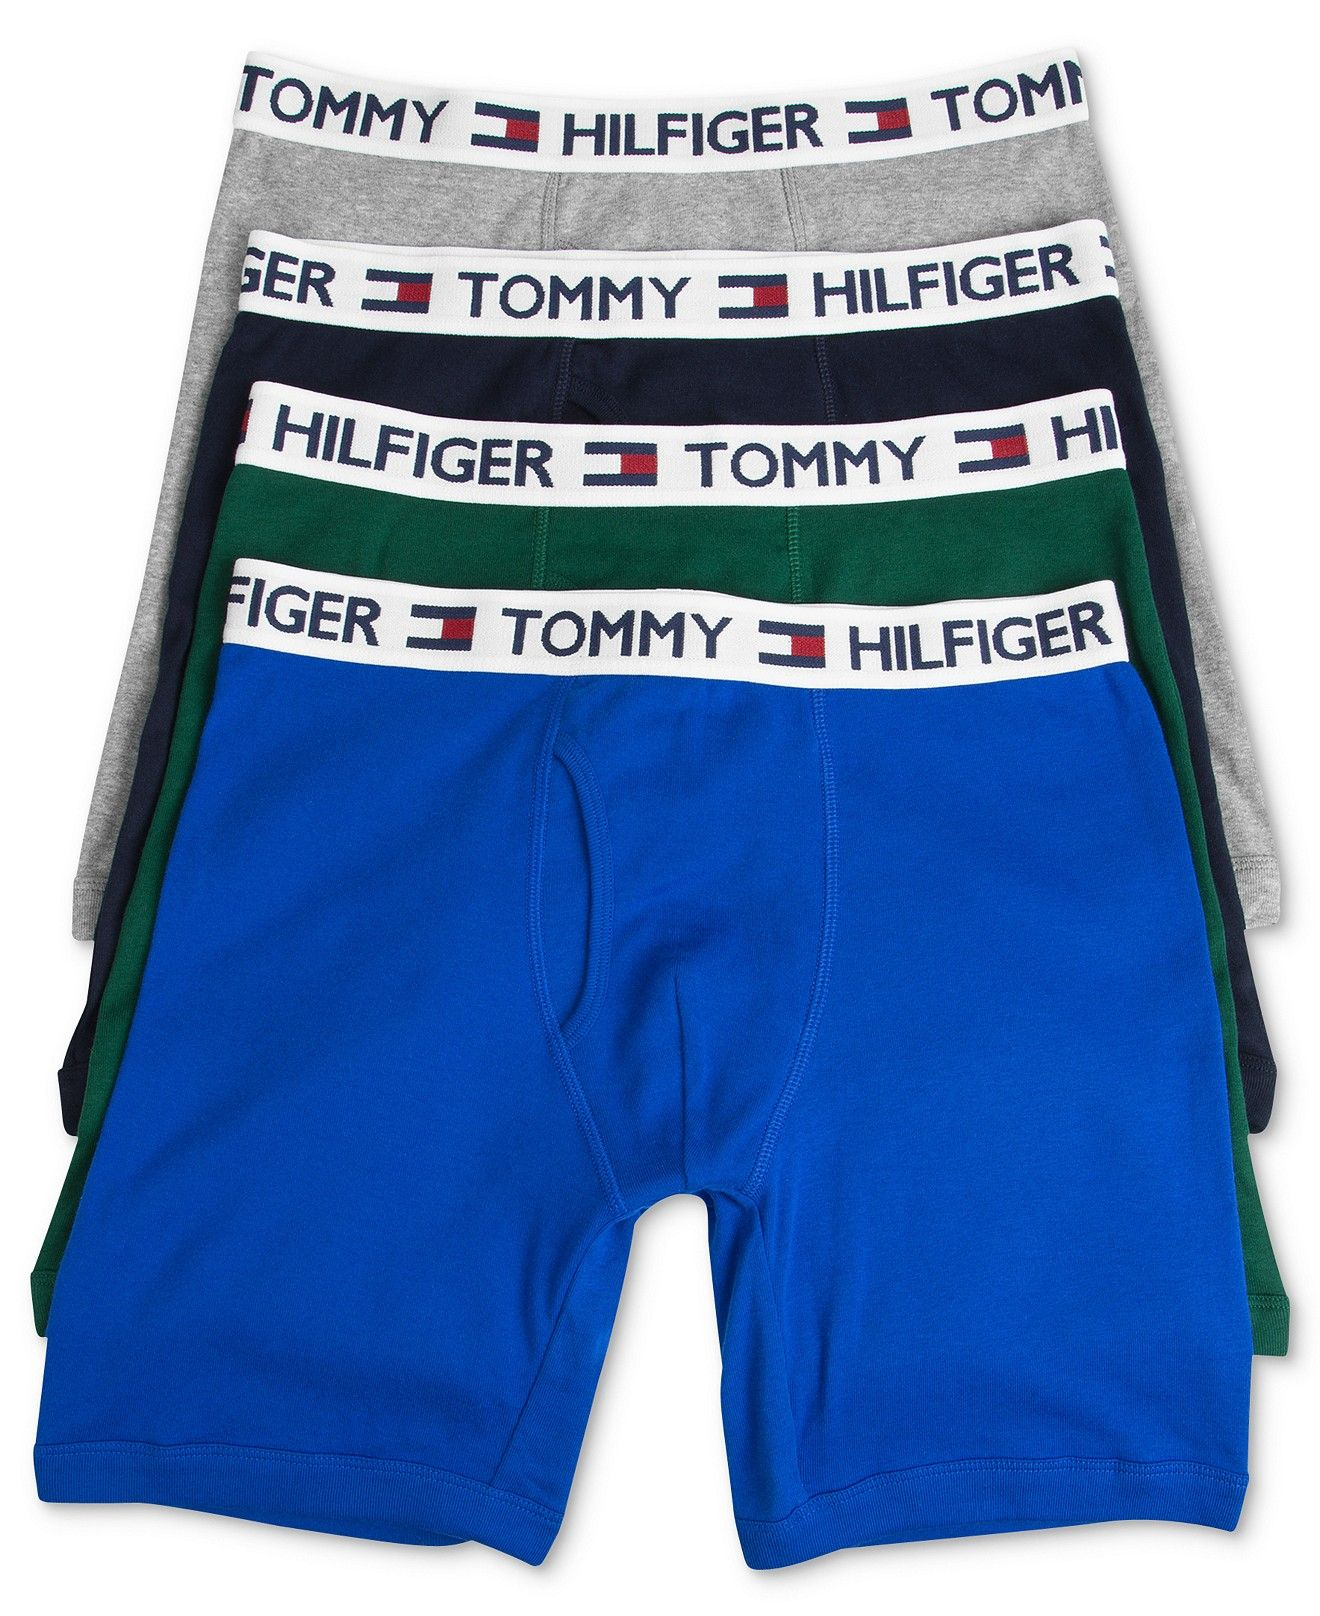 NEW Tommy Hilfiger Men's Underwear 4-Pack Classic Fit Cotton Boxer Brief Set